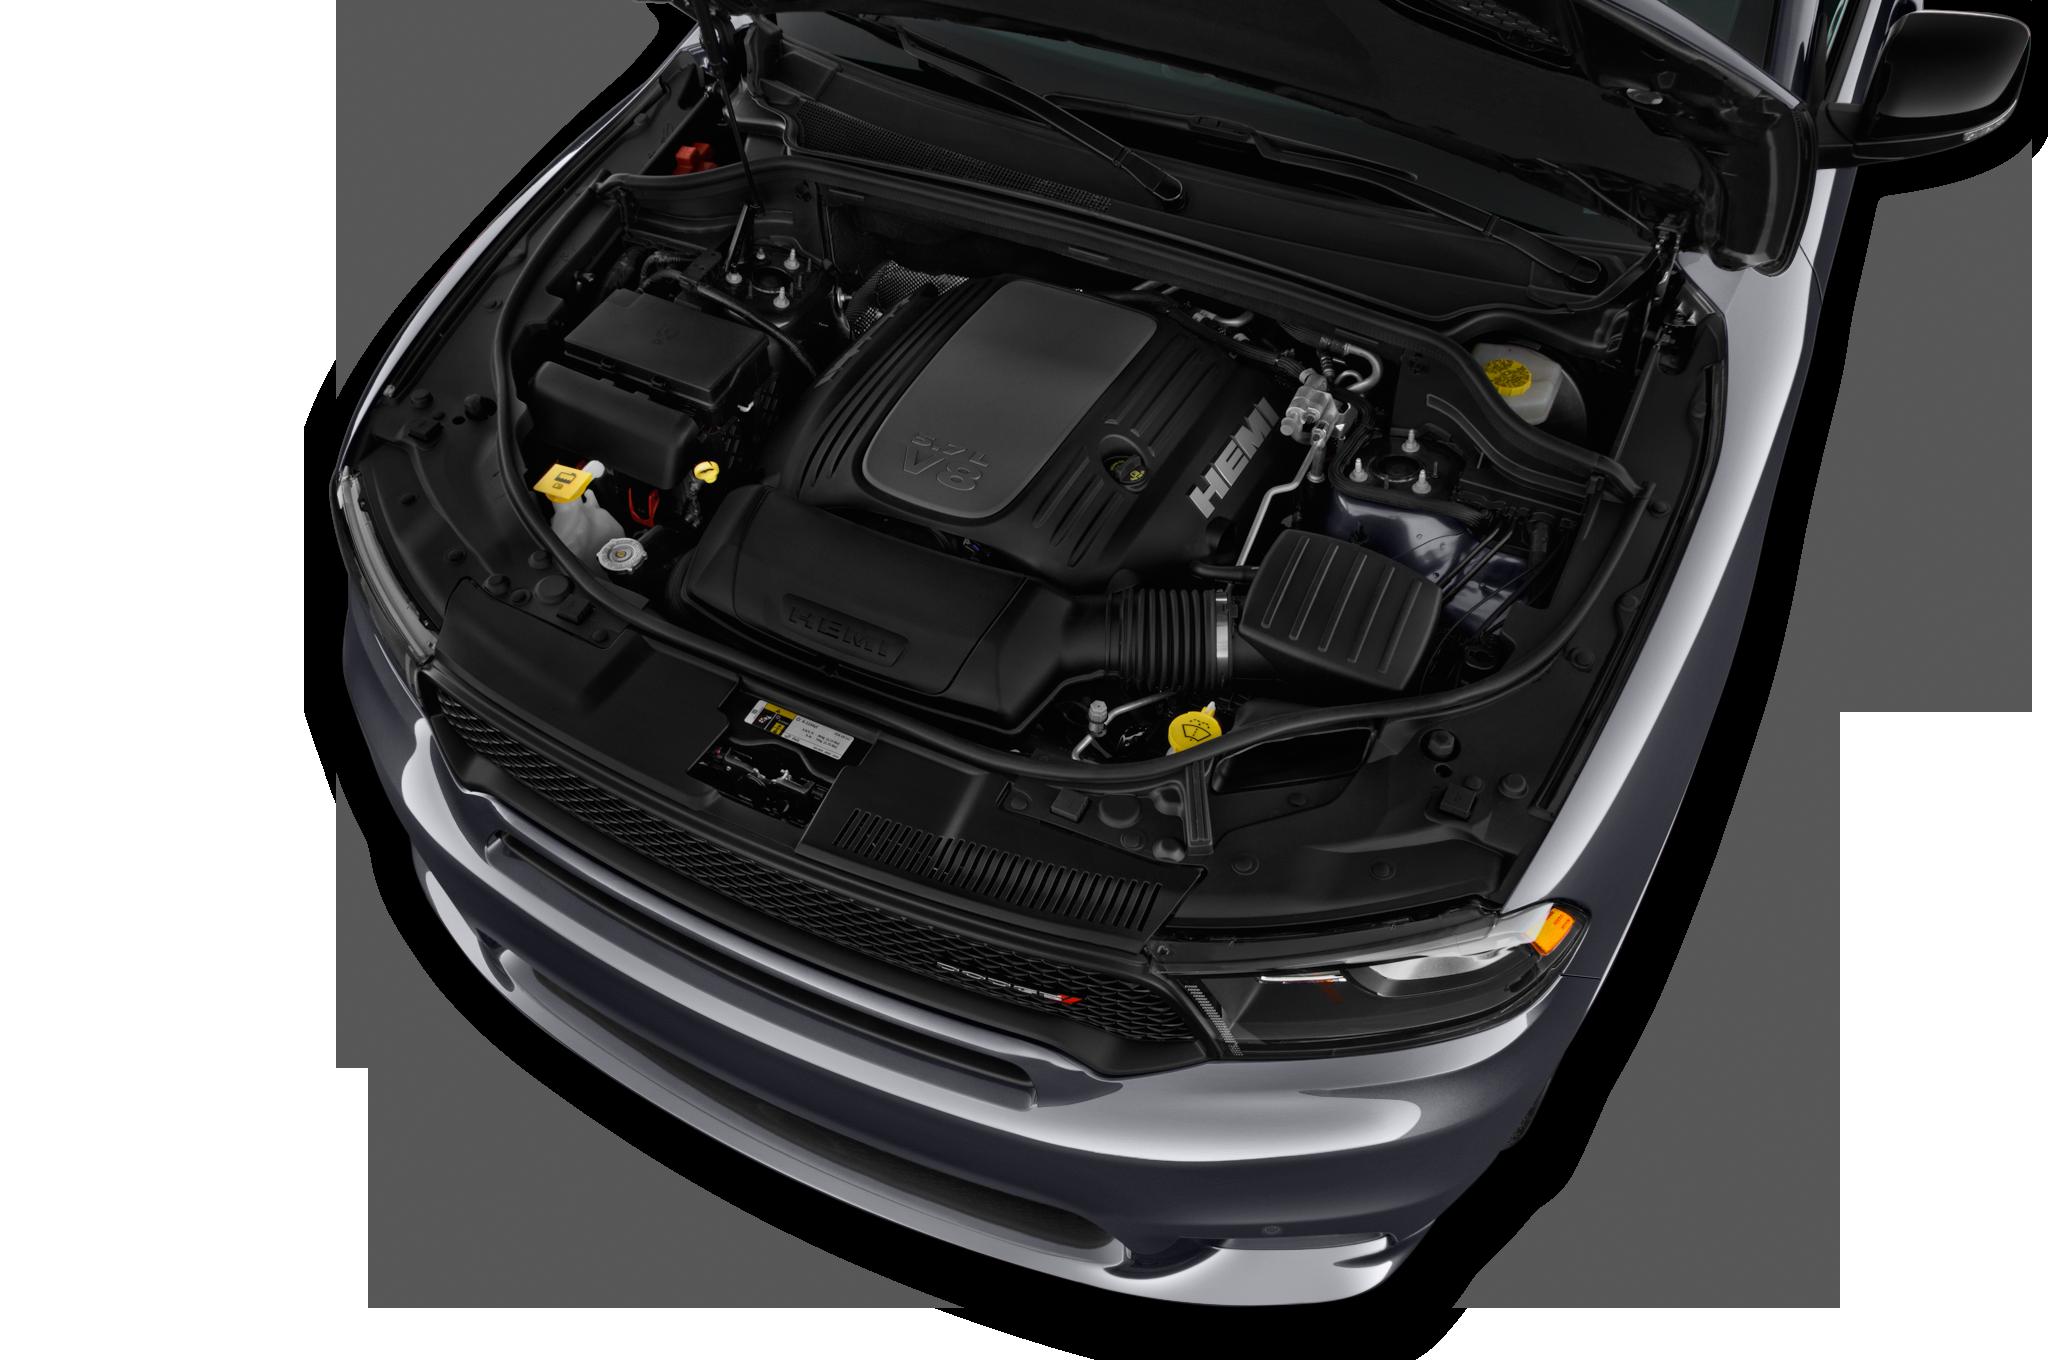 Rt 46 Jeep >> 2018 Dodge Durango R/T and SRT Gets Stripes and More Mopar Performance Goodies | Automobile Magazine